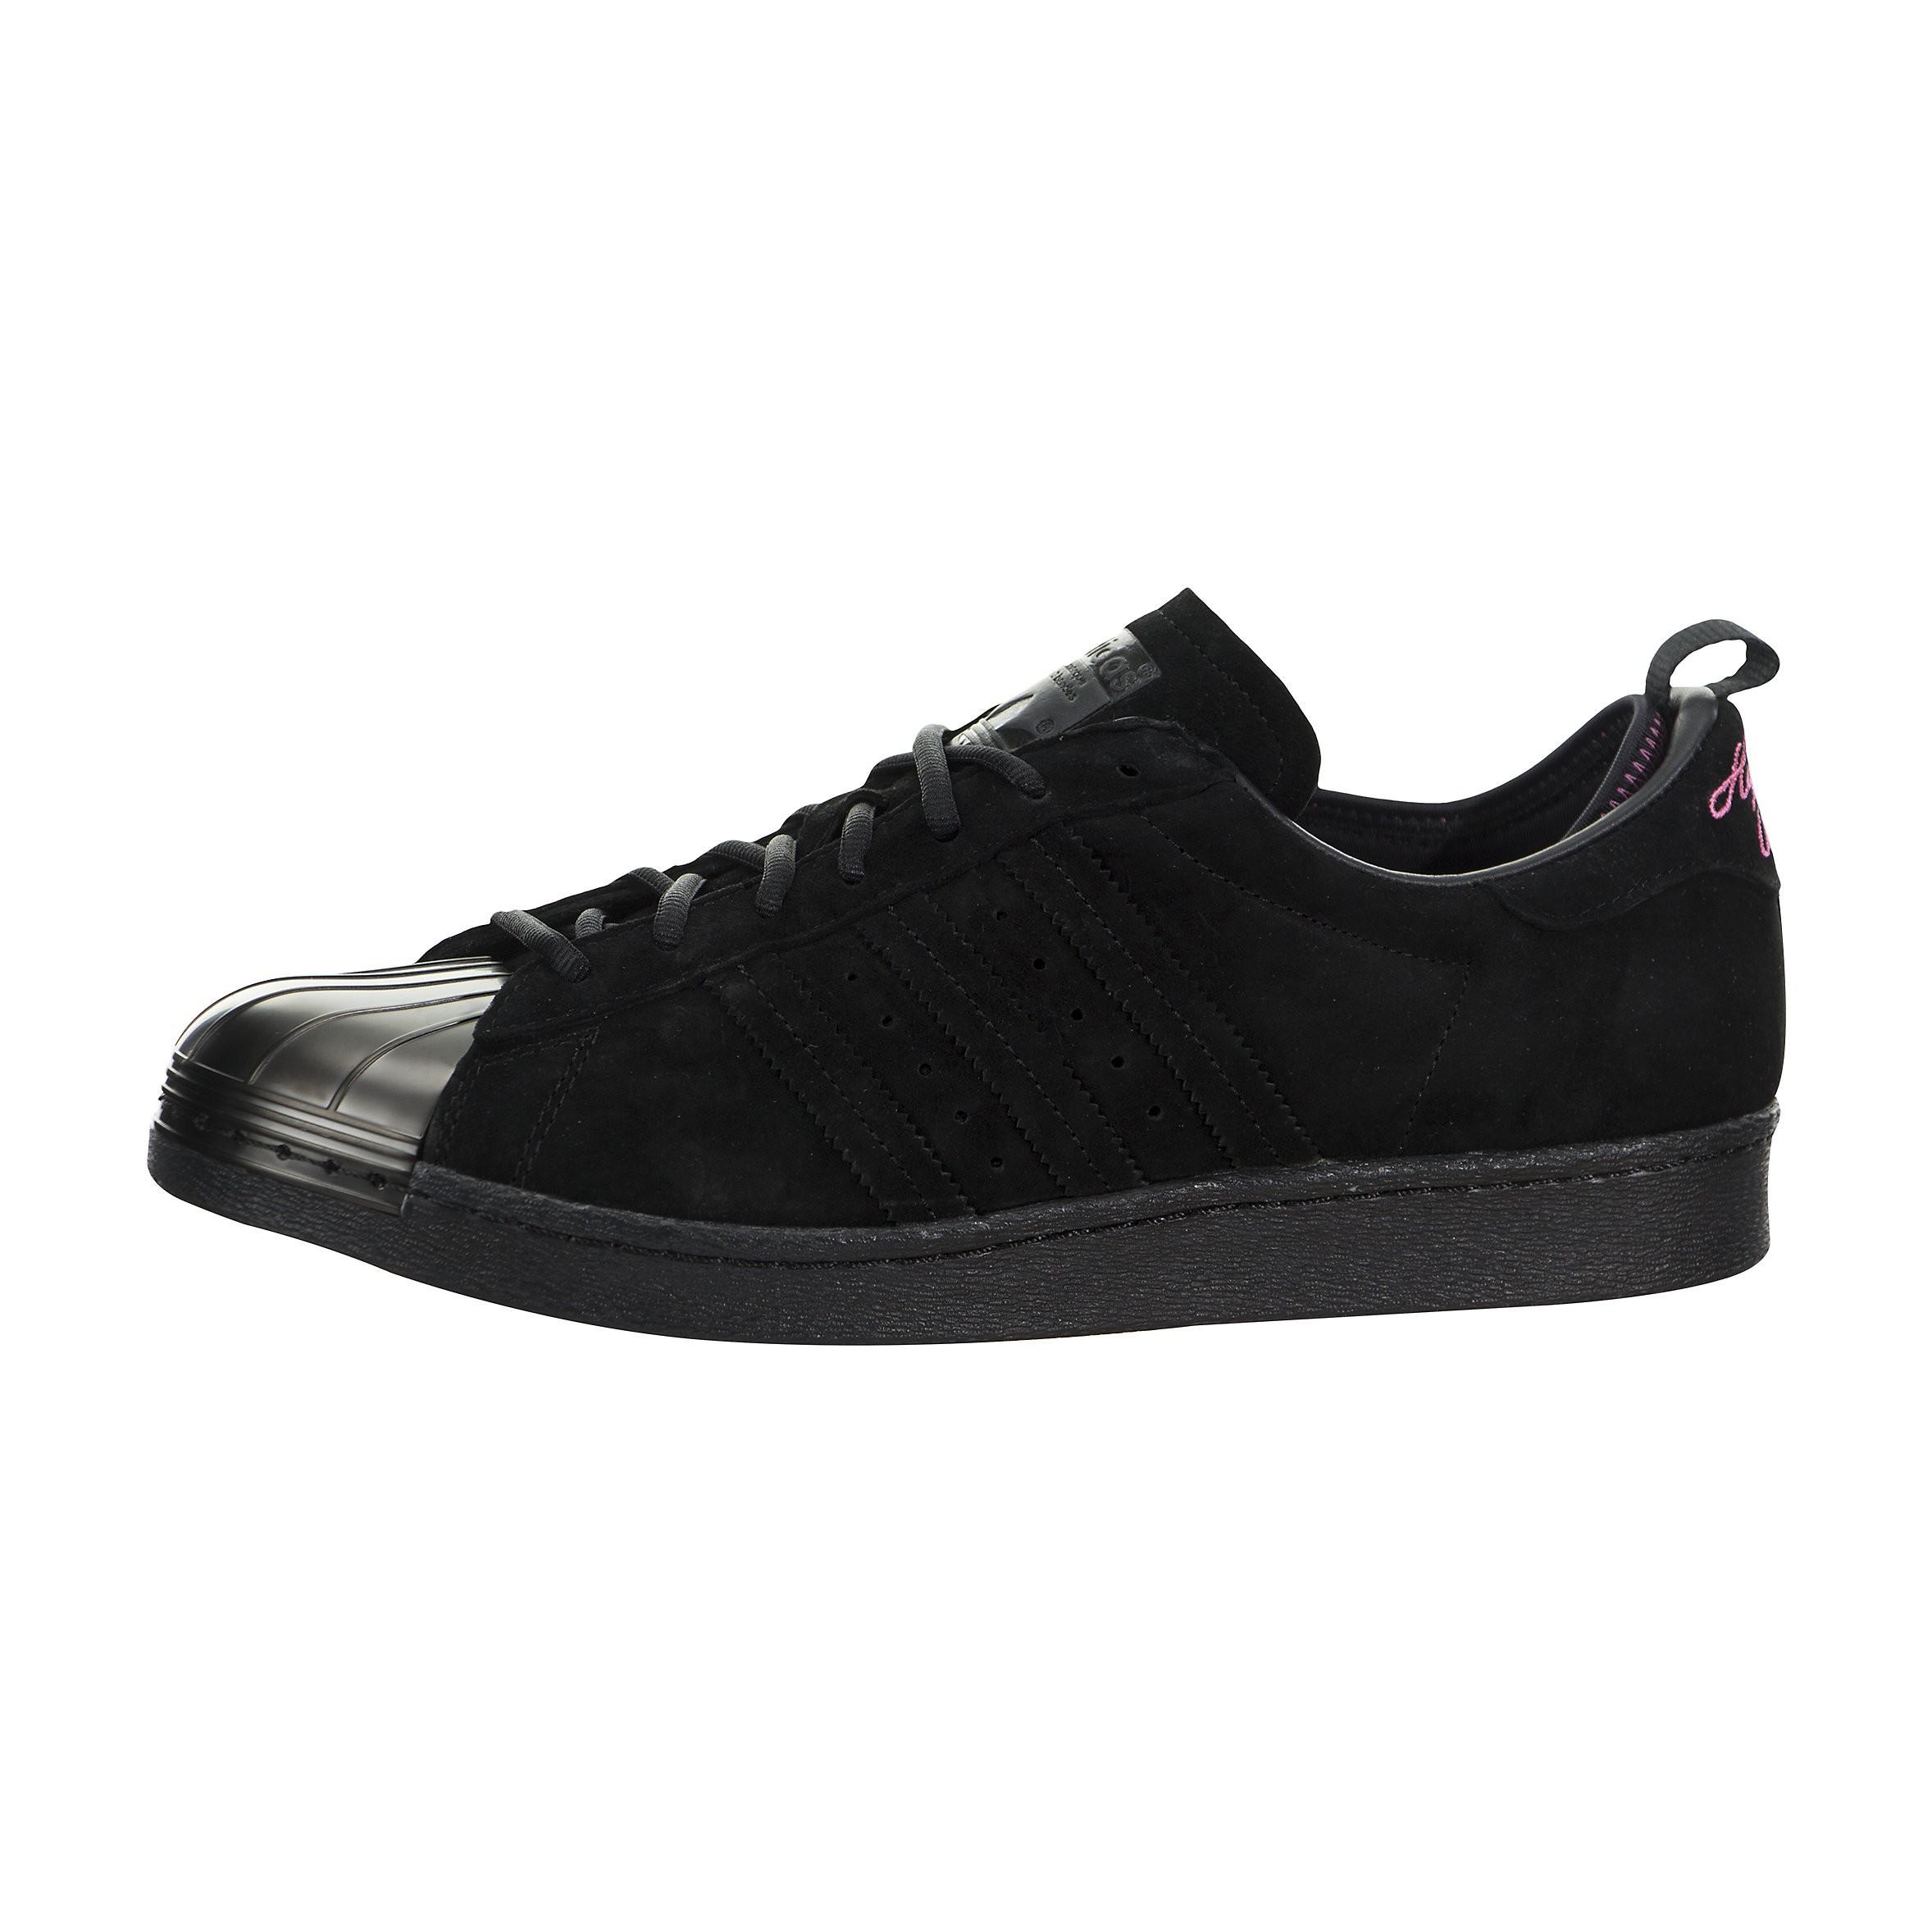 Hombre adidas X Eddie Huang Superstar 80s Metal Toe Negras f37748